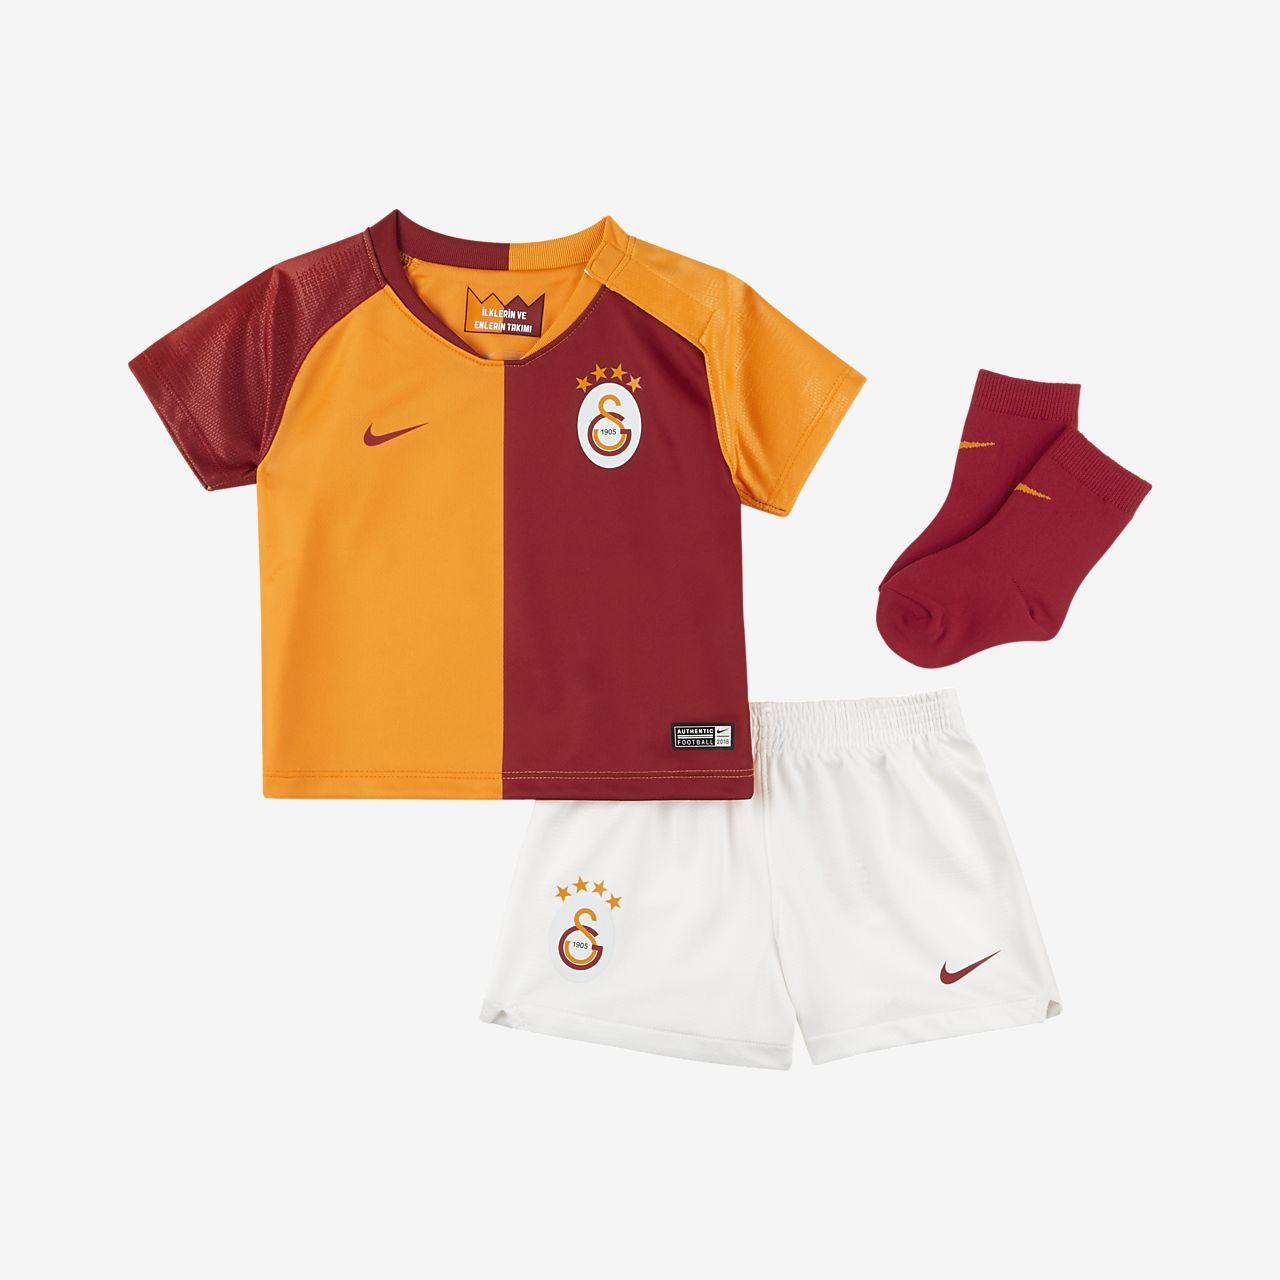 2018/19 Galatasaray S.K.Stadium Home Fußballtrikot-Set für Kleinkinder 2018/19 Galatasaray S.K.Stadium Home Fußballtrikot-Set für Kleinkinder